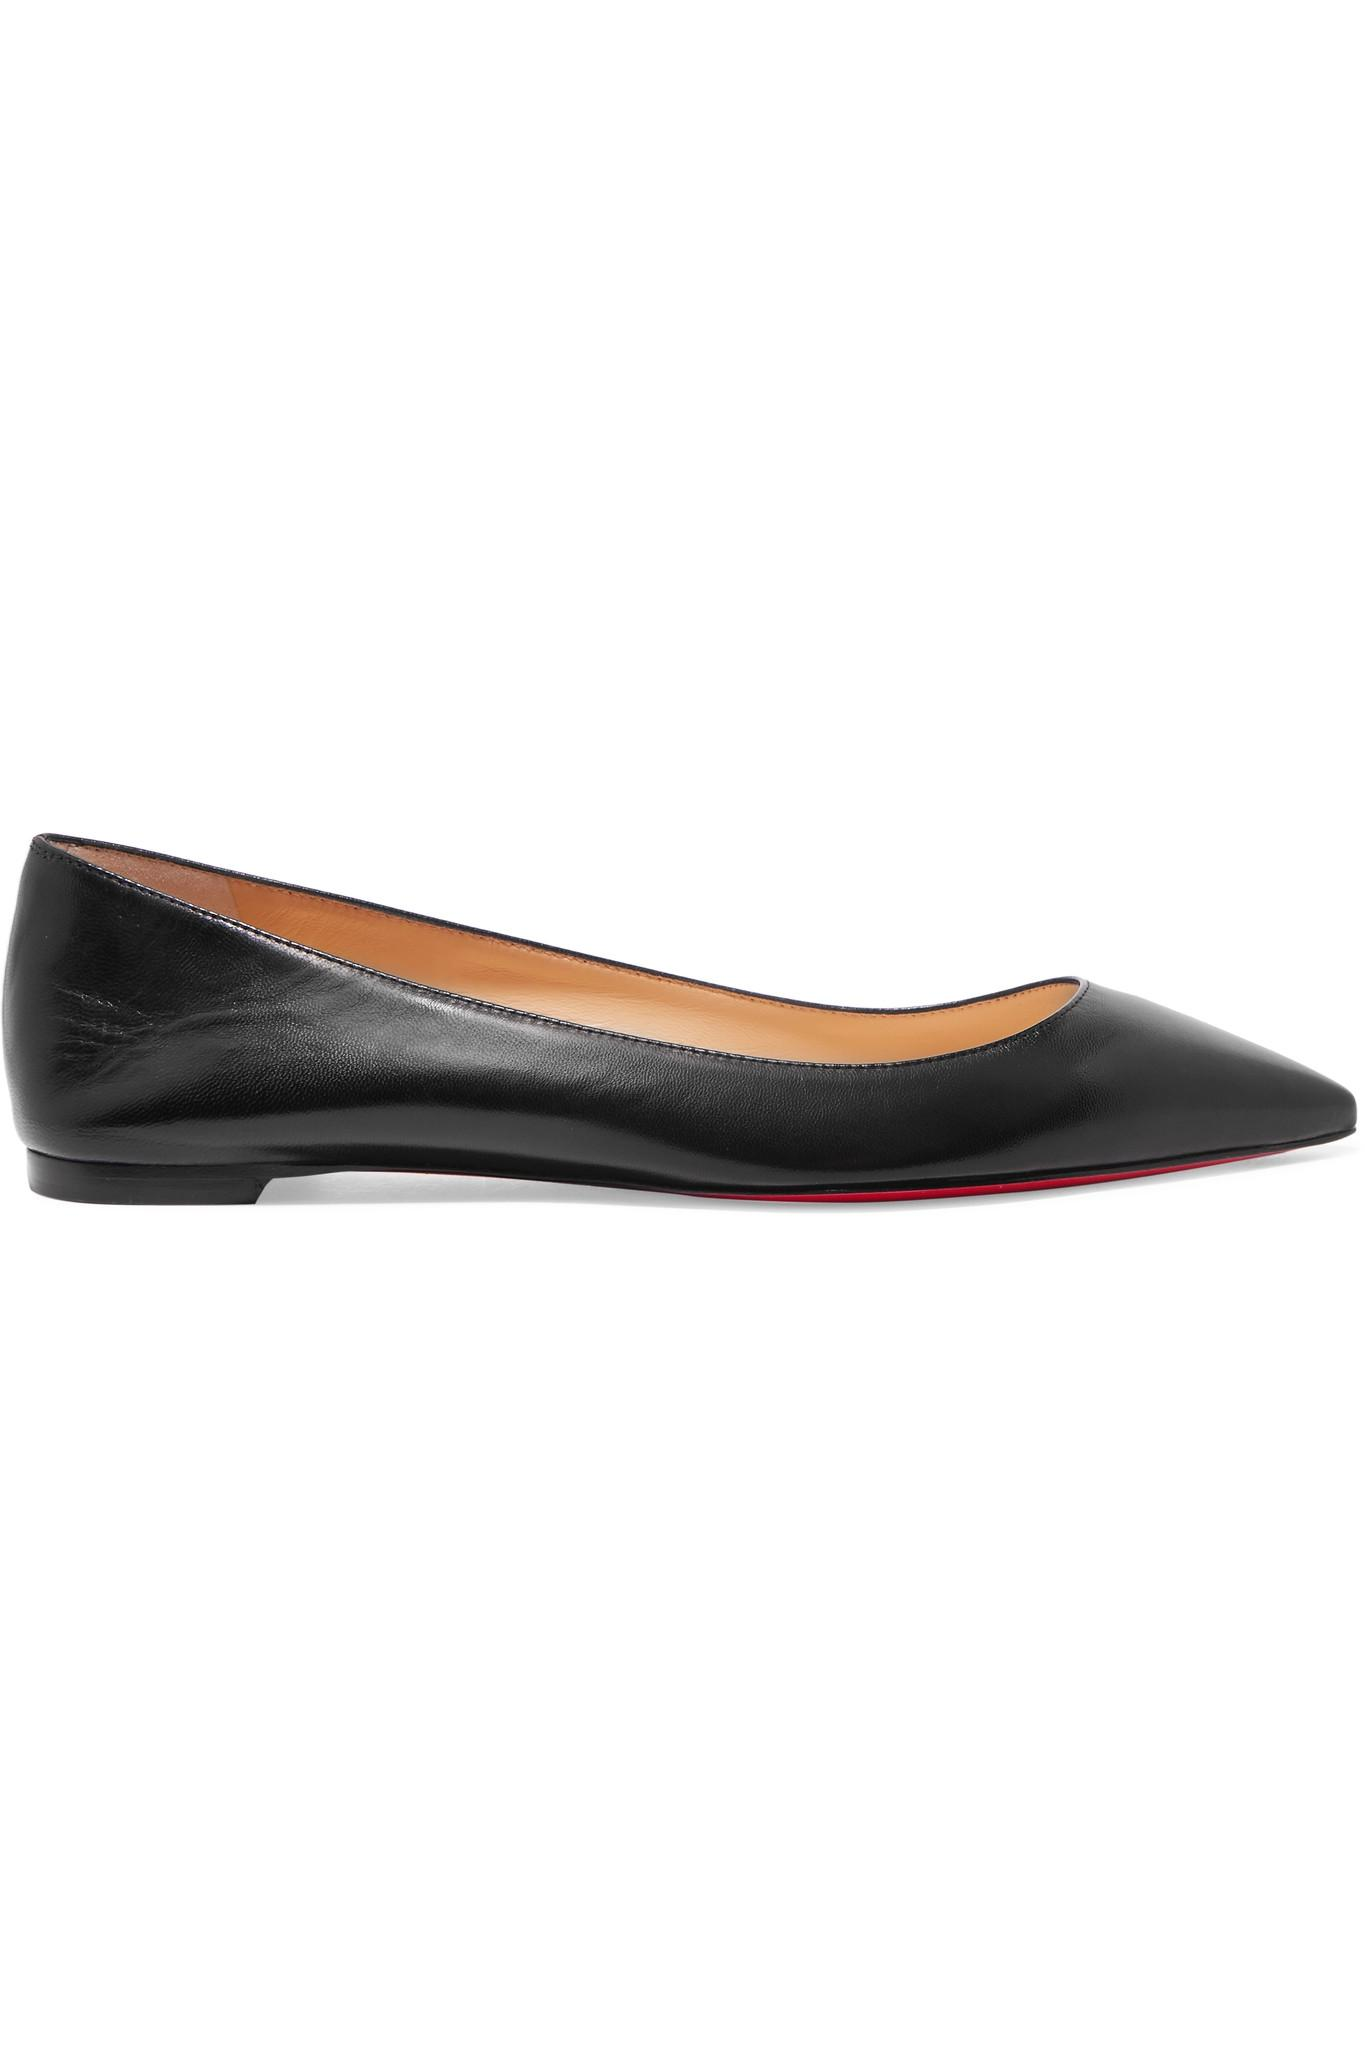 6c29b1d5c13 Lyst - Christian Louboutin Ballalla Leather Ballet Flats in Black